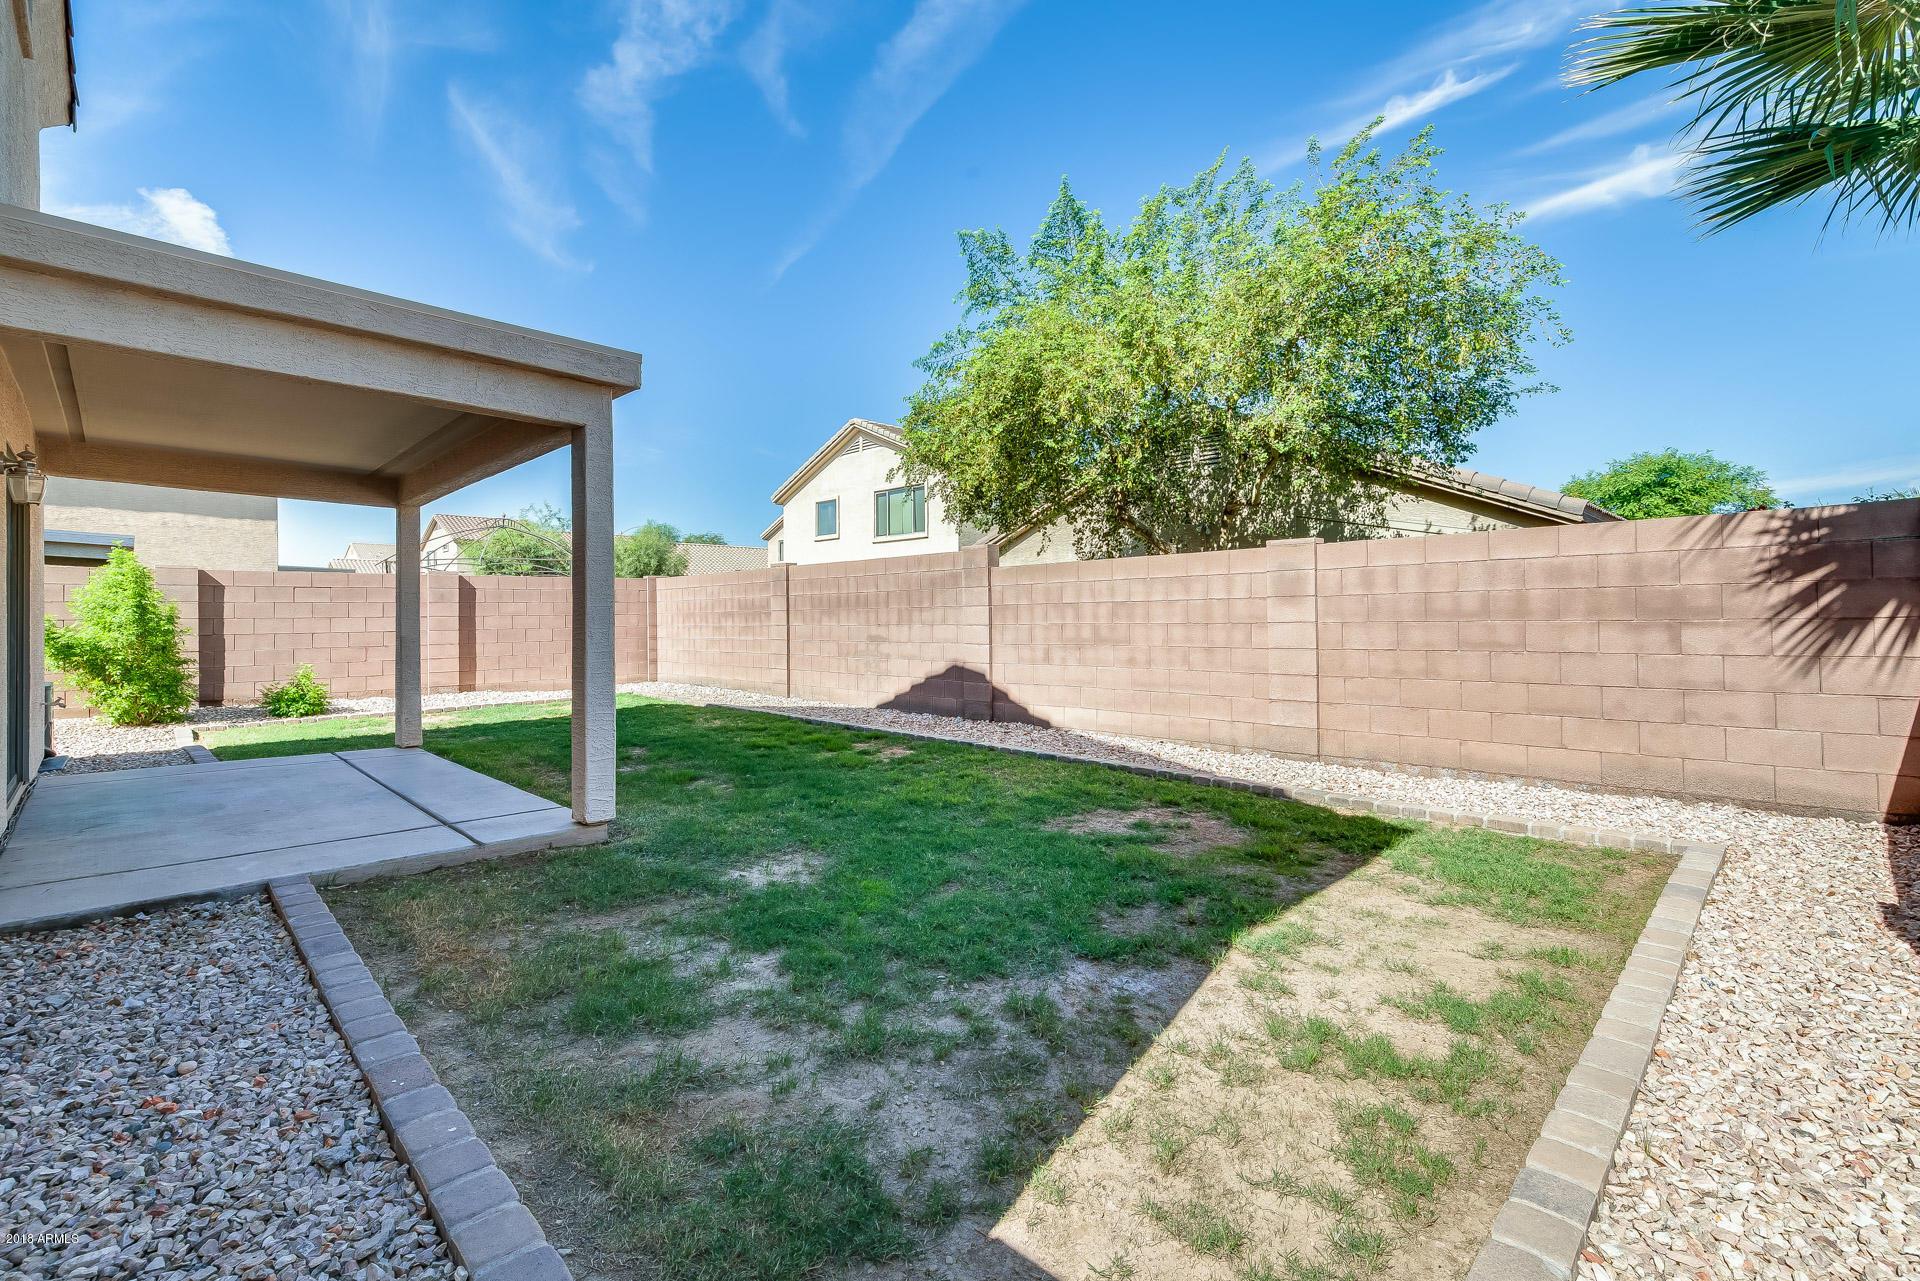 MLS 5838336 12352 W DEVONSHIRE Avenue, Avondale, AZ 85392 Avondale AZ Rio Crossing